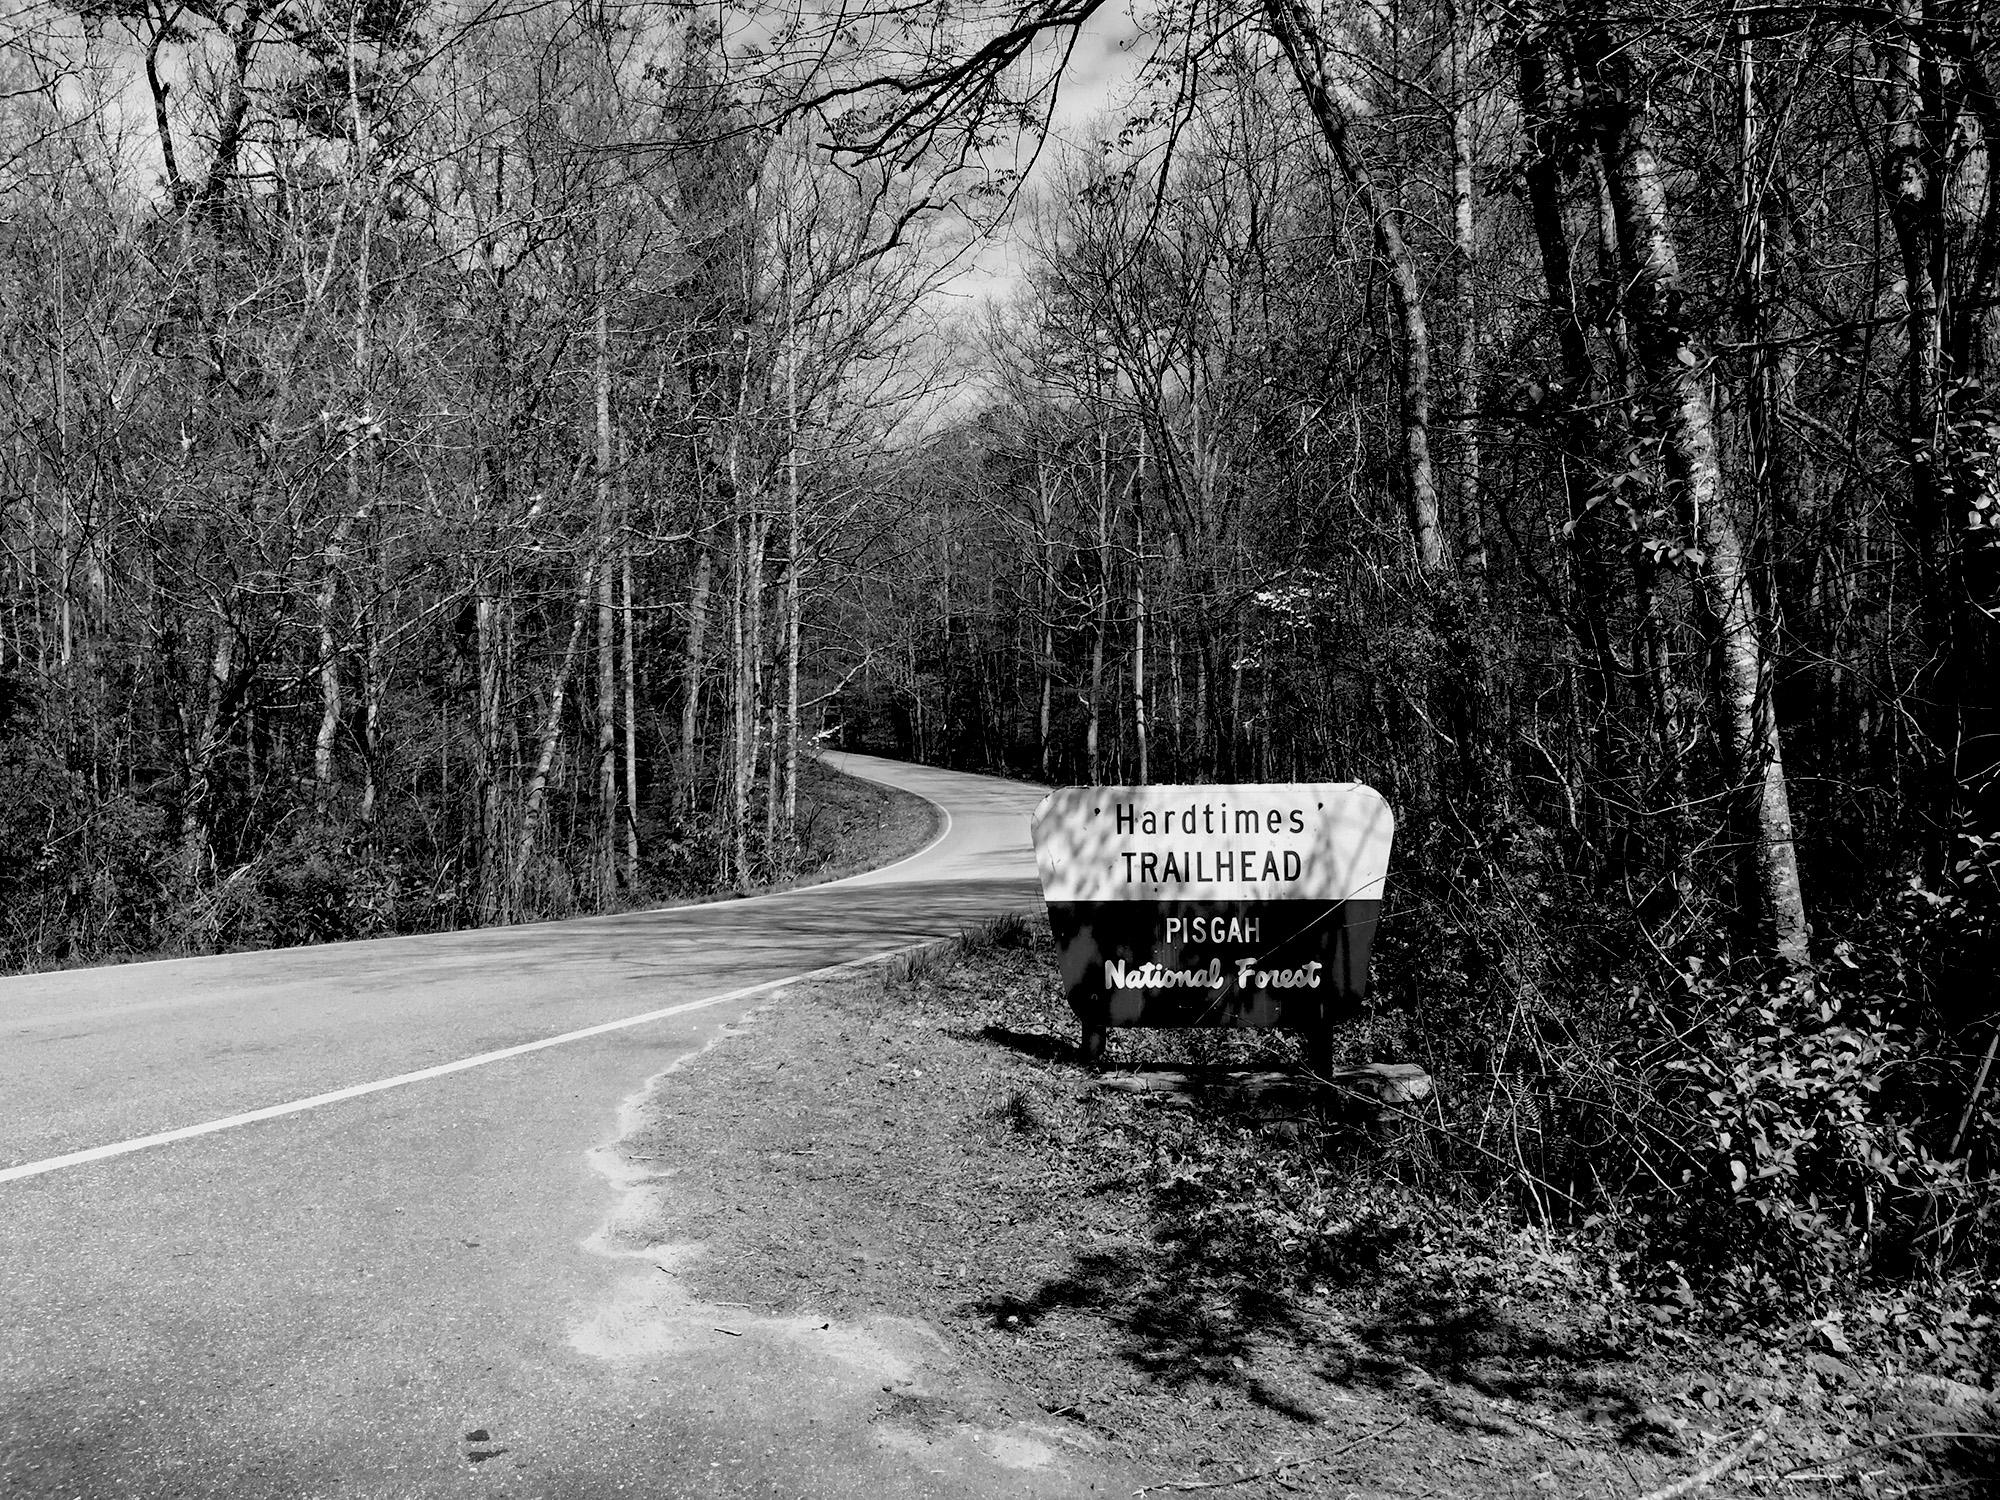 Hardtimes Trailhead, Pisgah National Forest / Darker than Green